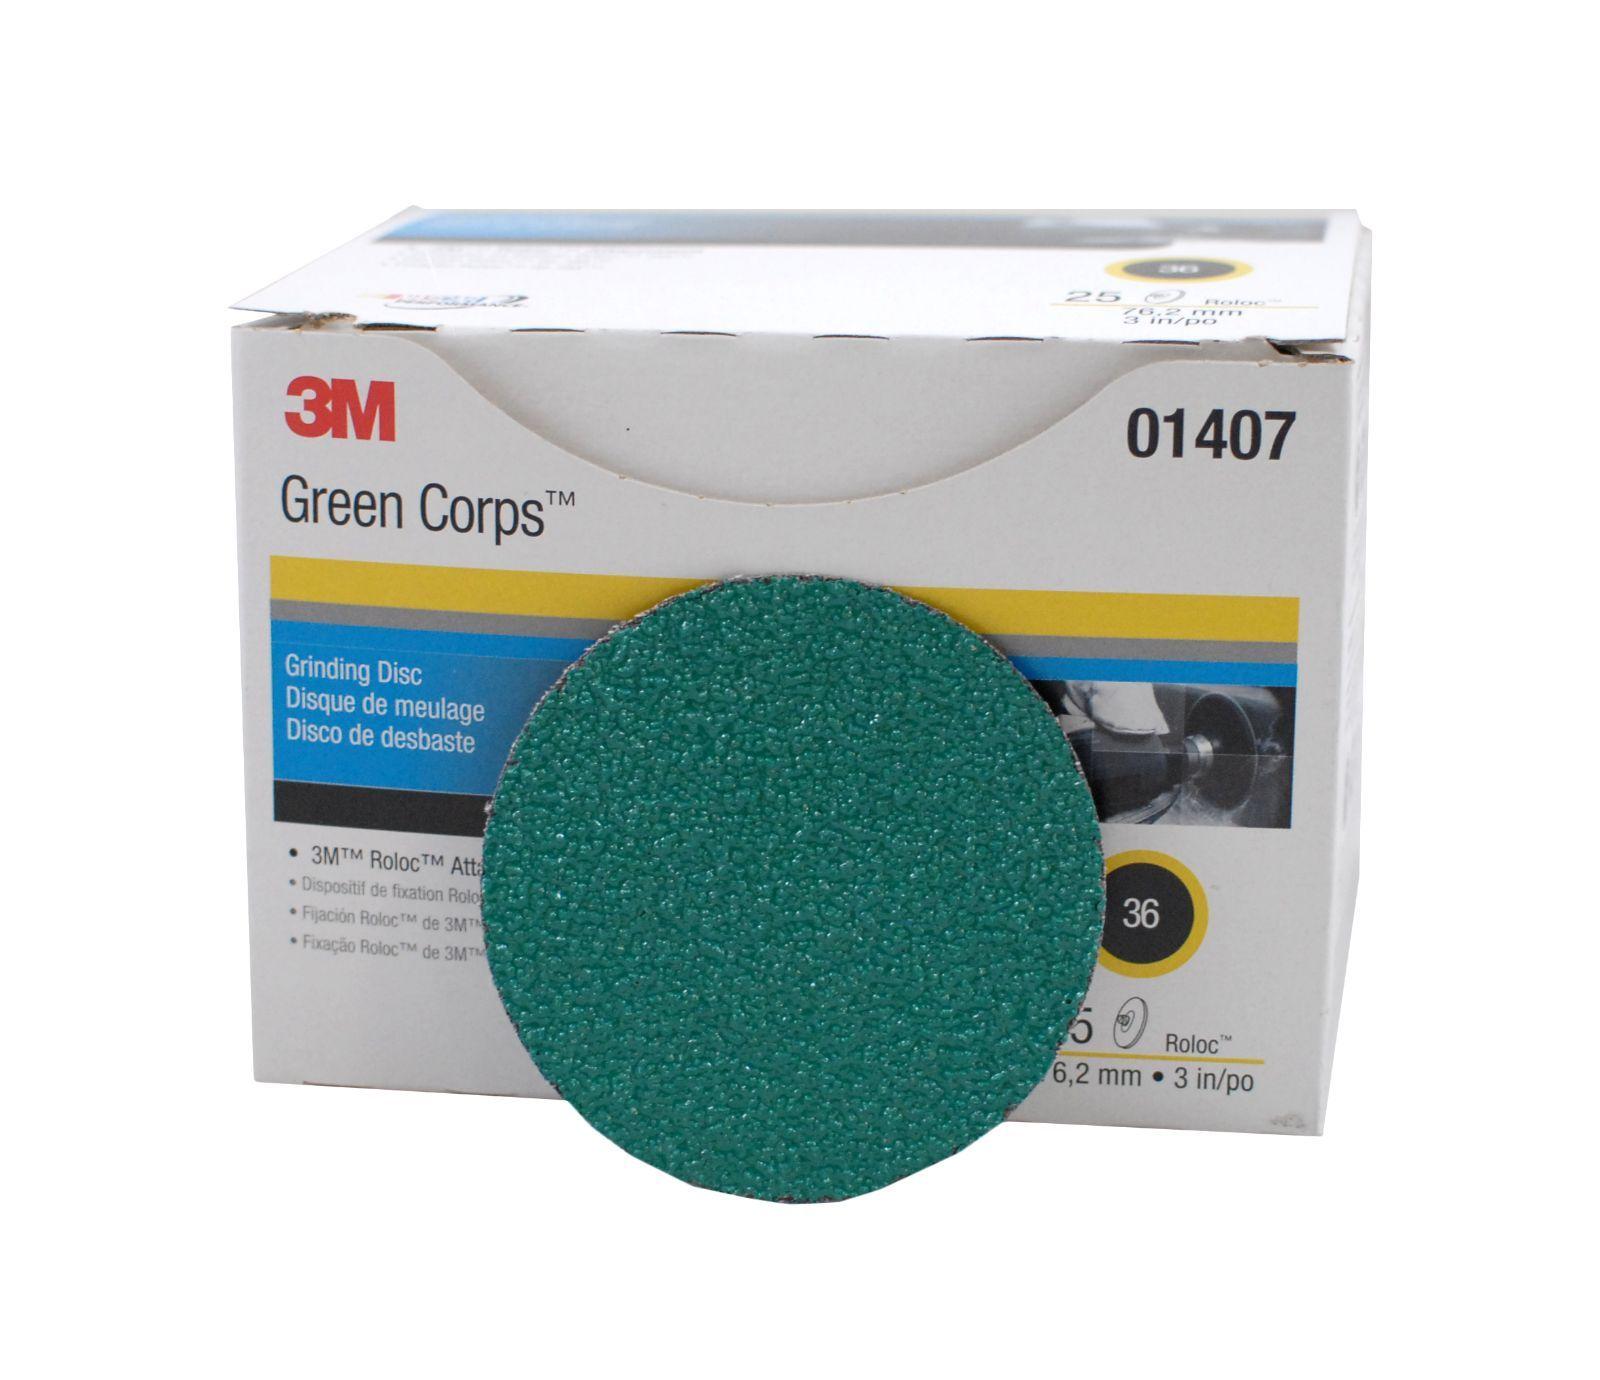 3m 01407 3 Inch Green Corps Roloc Sanding Discs 36 Grit